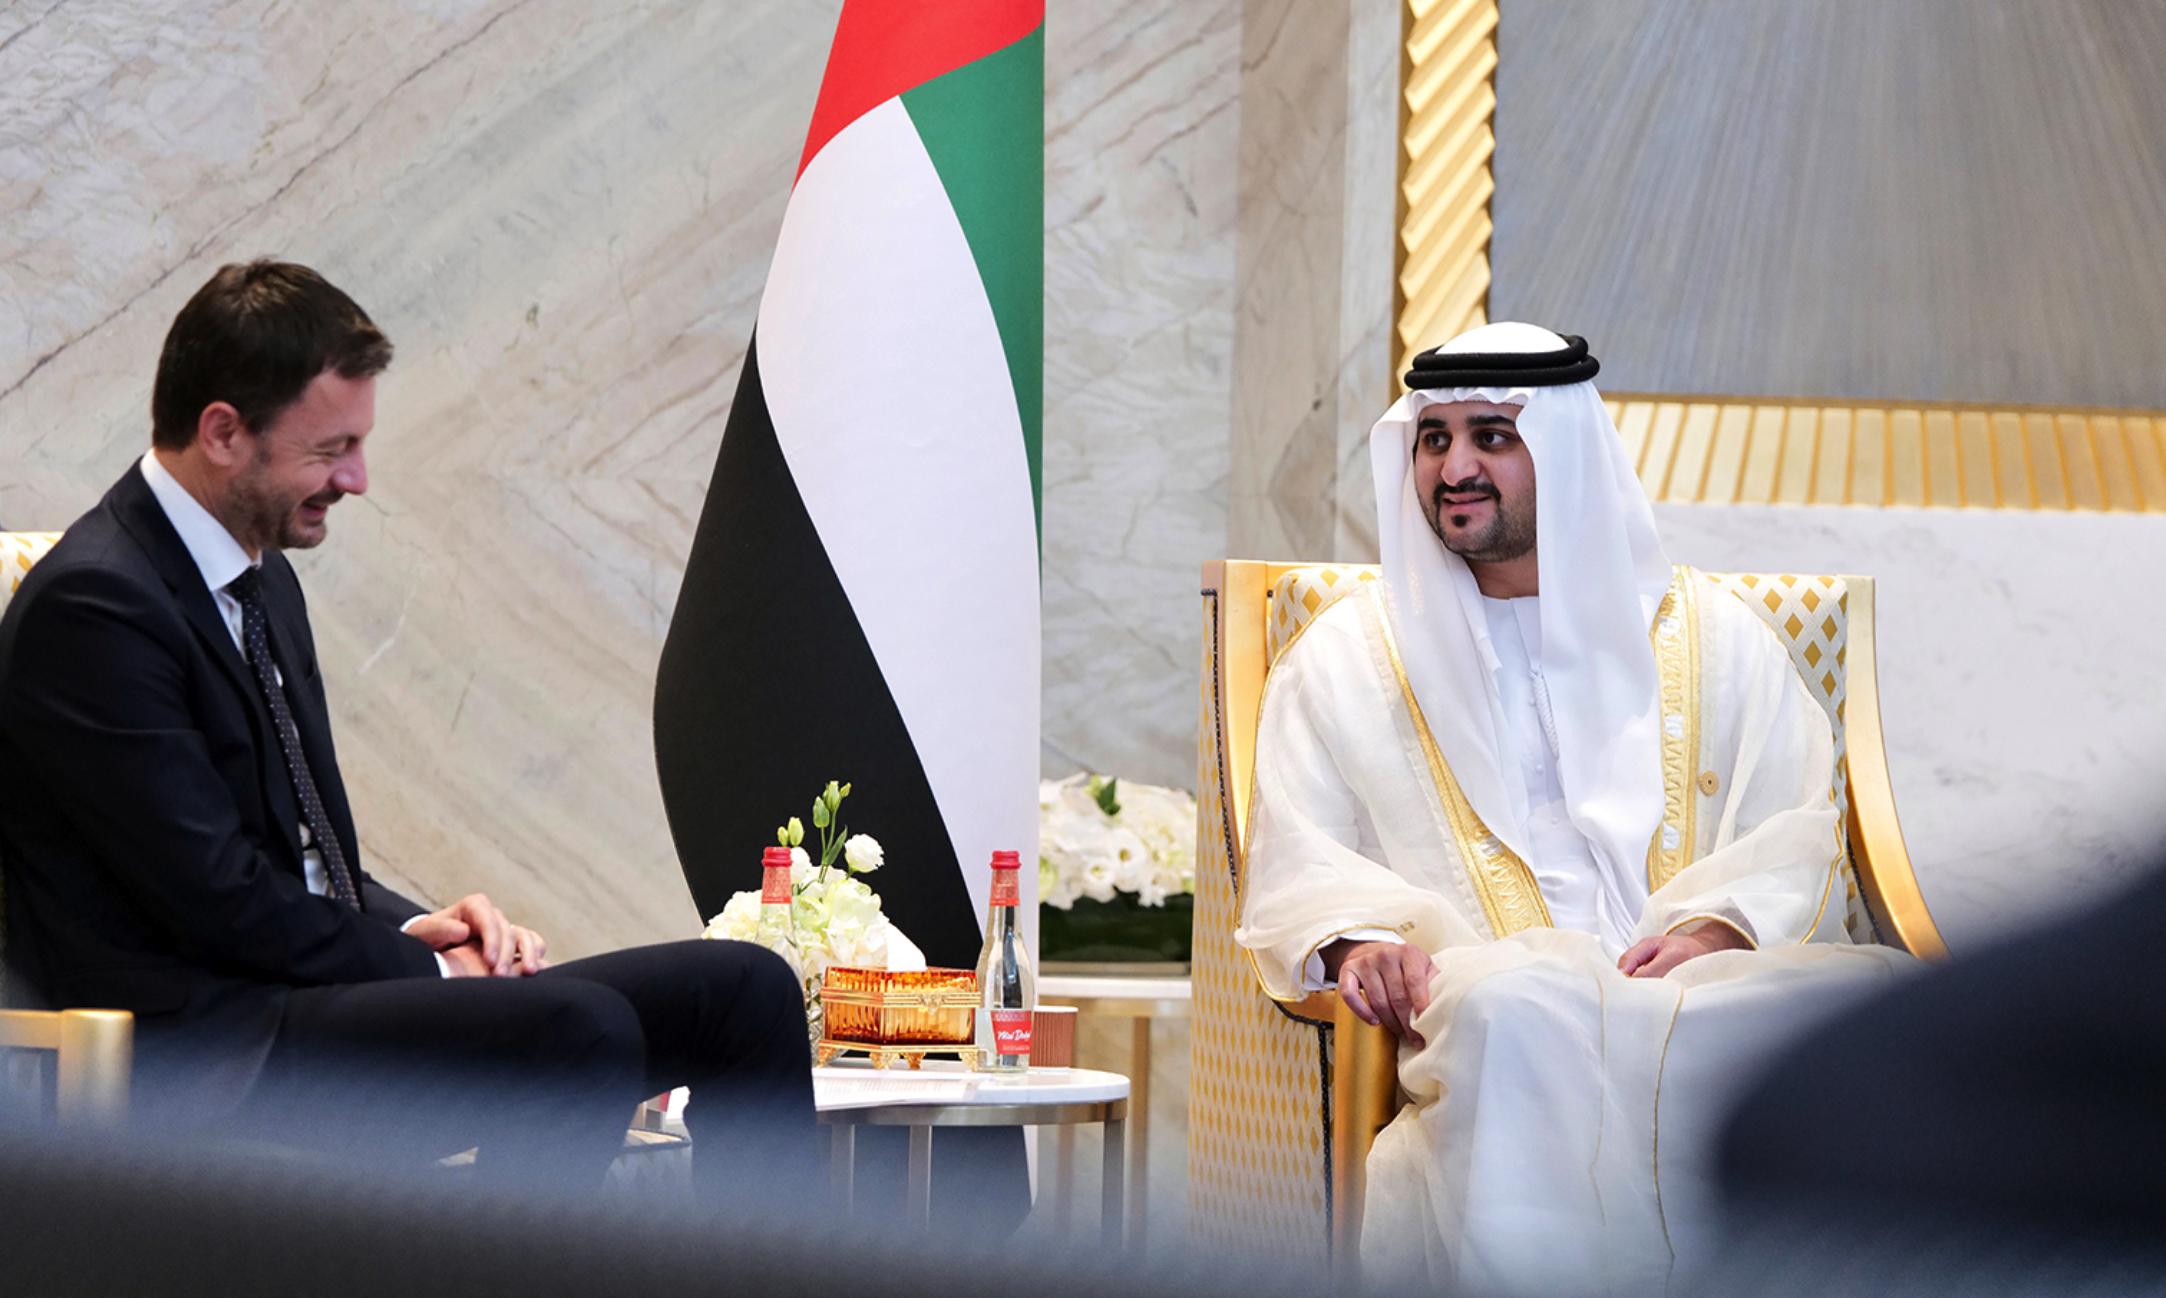 Expo 2020 Dubai: Sheikh Maktoum meets Slovak prime minister